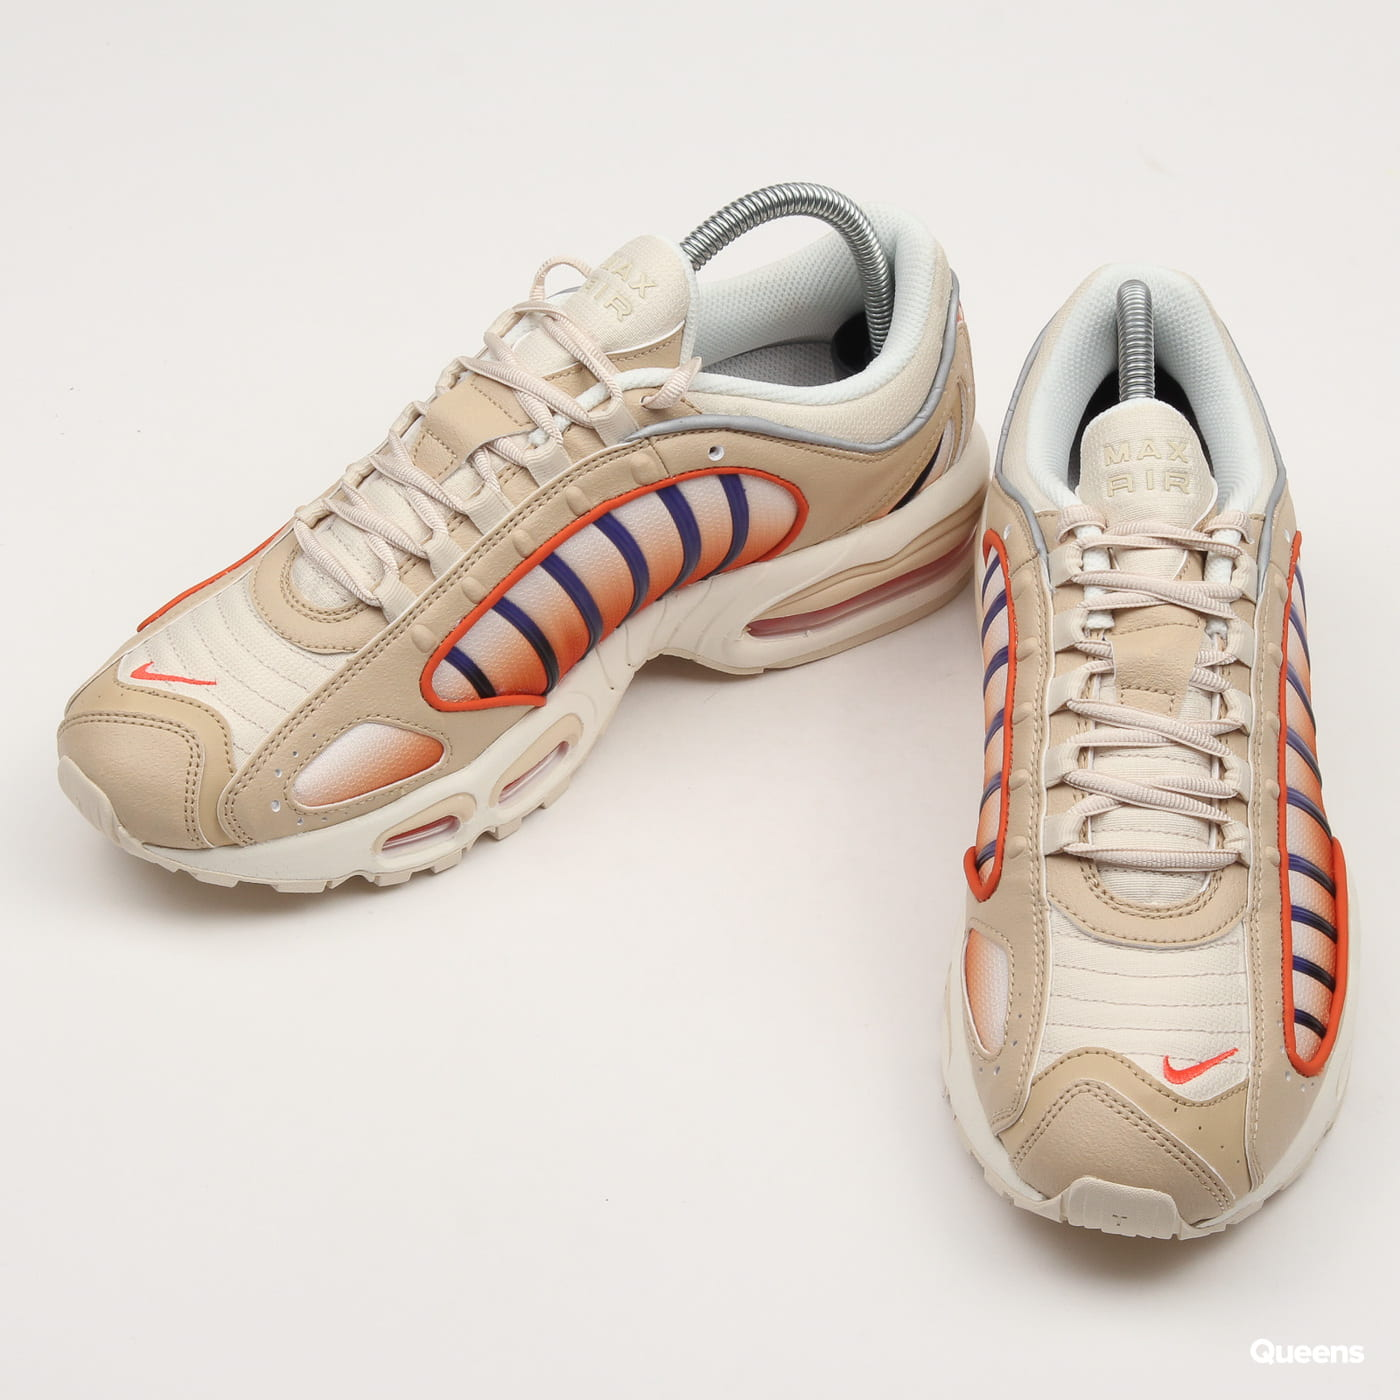 Nike Air Max Tailwind IV desert ore / team orange